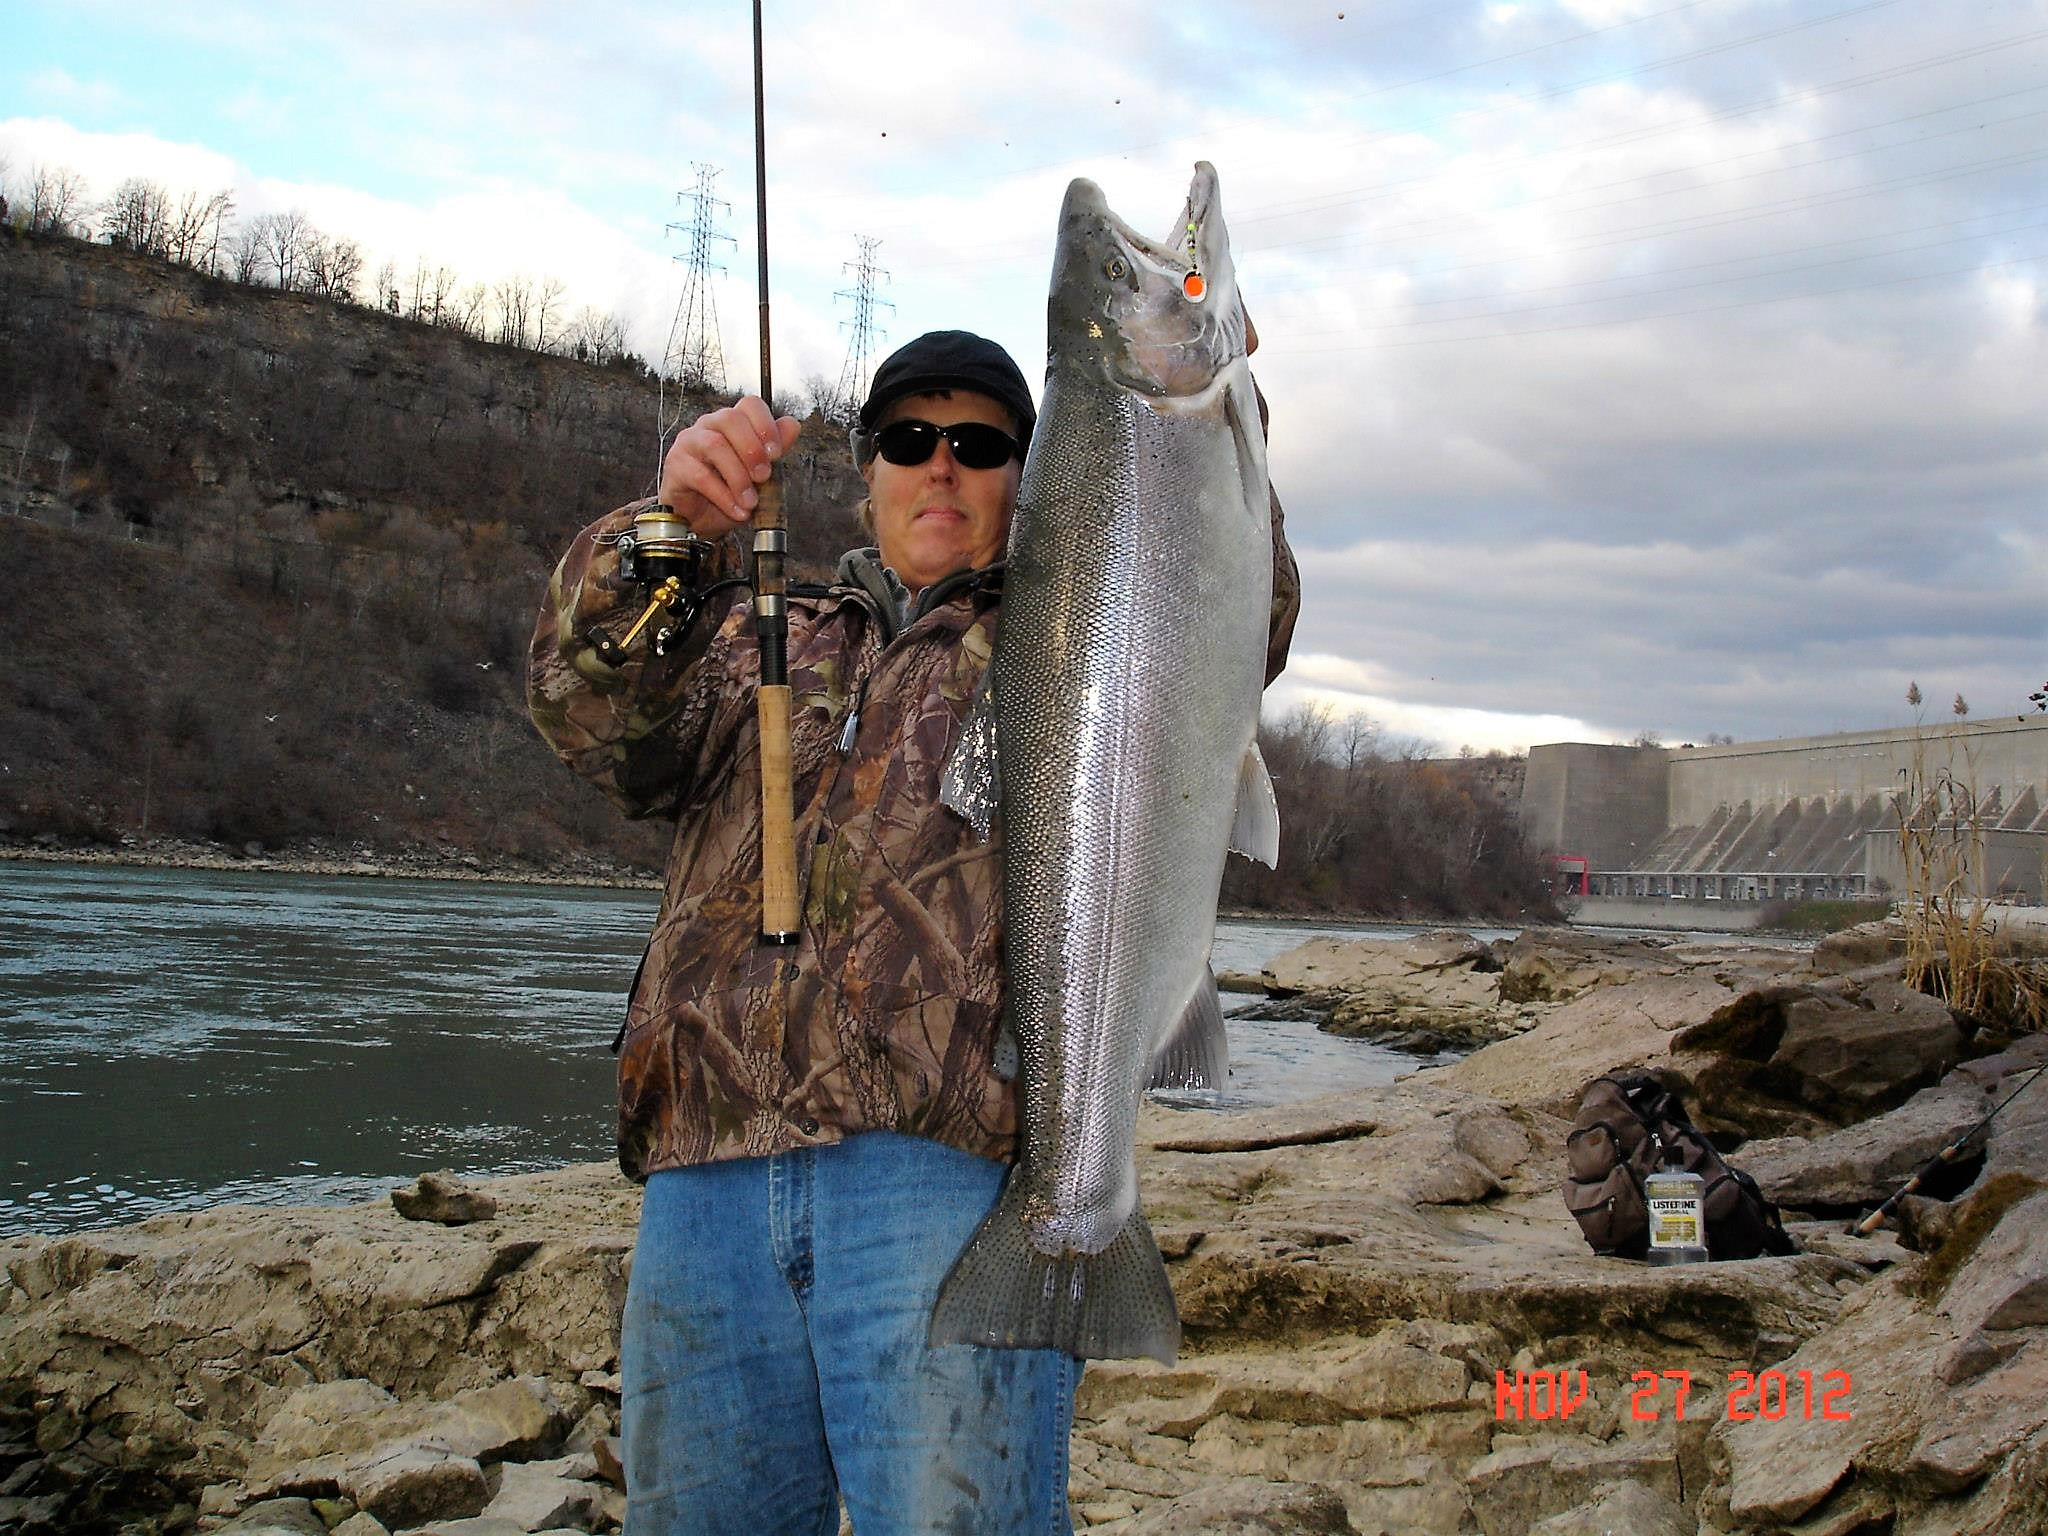 Niagara falls usa fishing forecast for nov 30 2017 for Lower niagara river fishing report